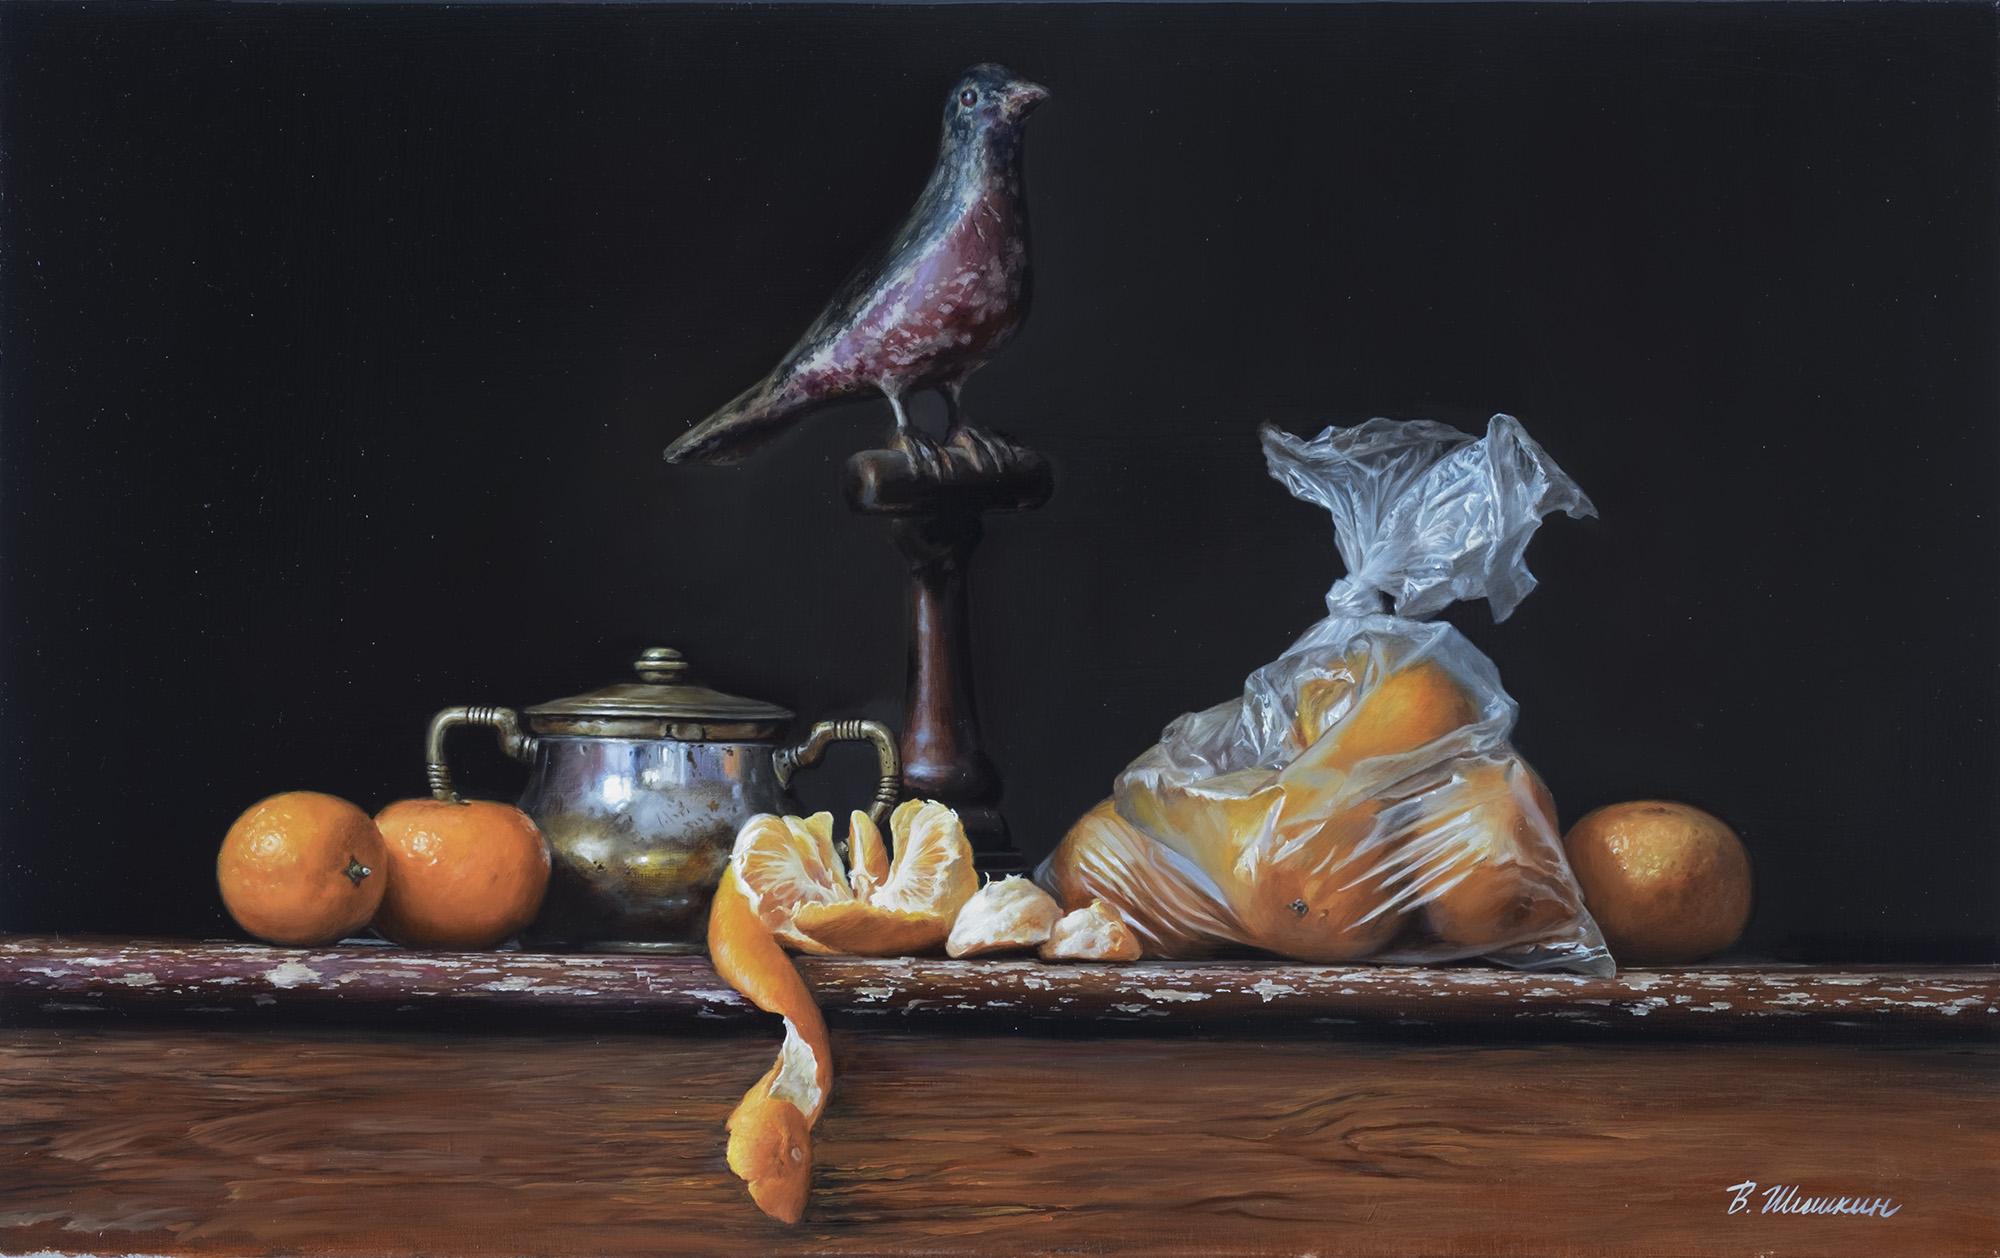 Still life with a bird